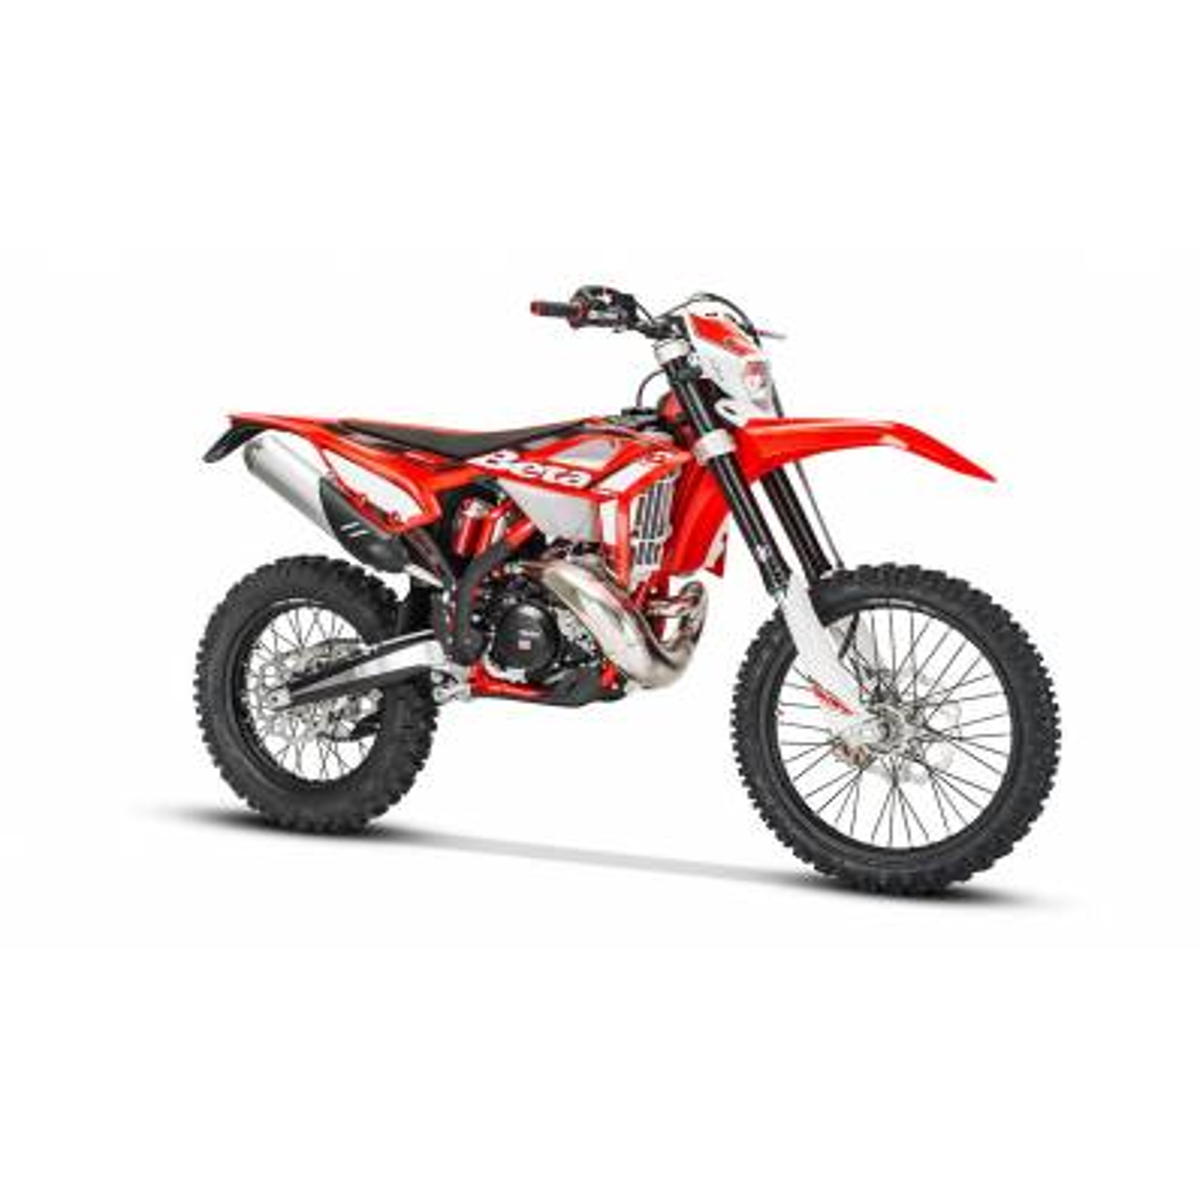 BETA ENDURO RR 250 2T 2021